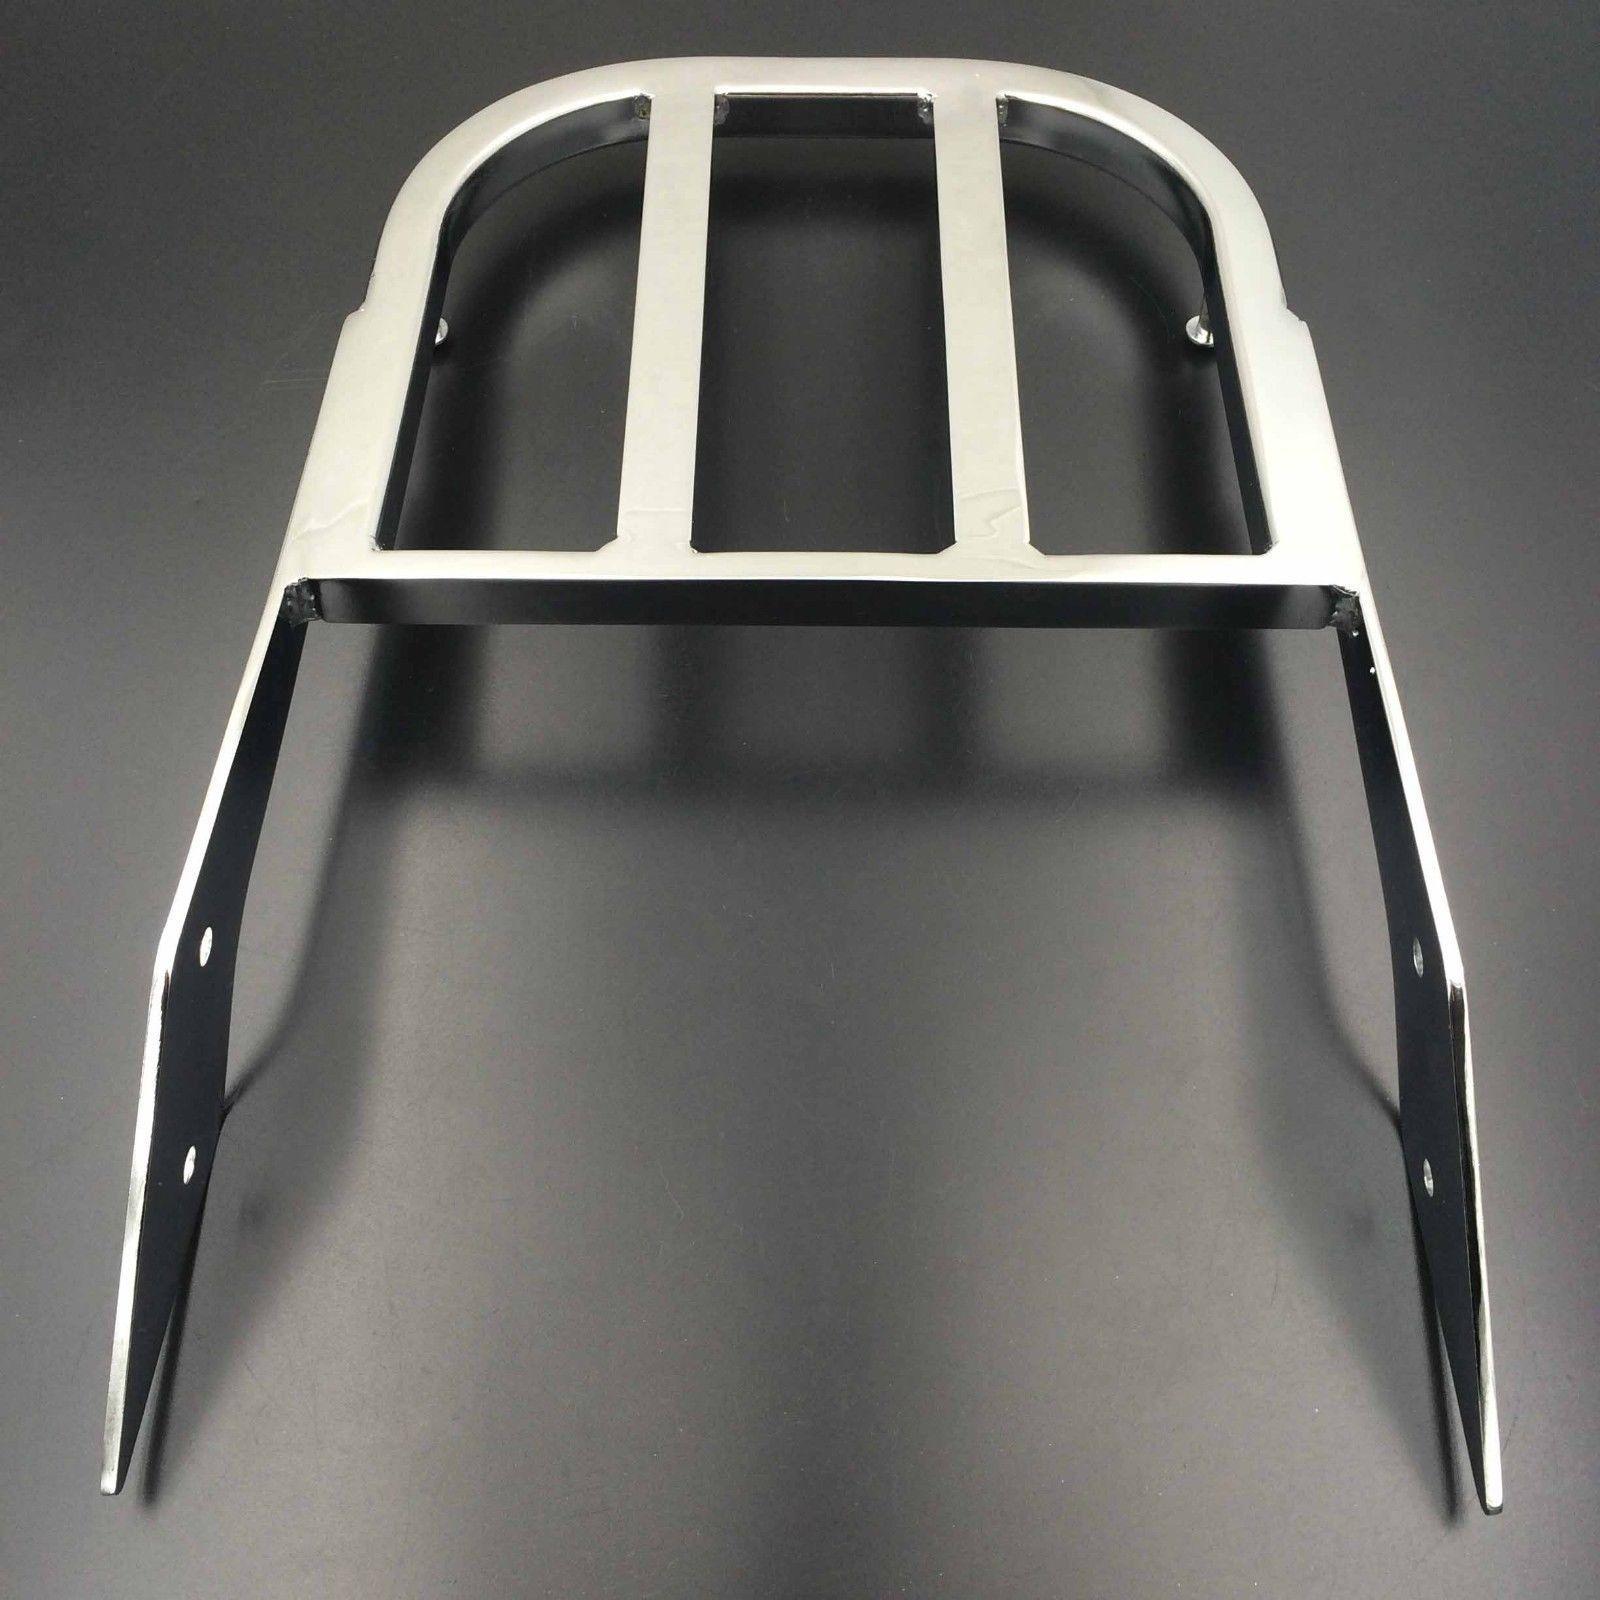 Chrome Sissy Bar Porte-Bagages Pour 03-06 Honda VTX 1300 N 2002-2008 VTX 1800 N